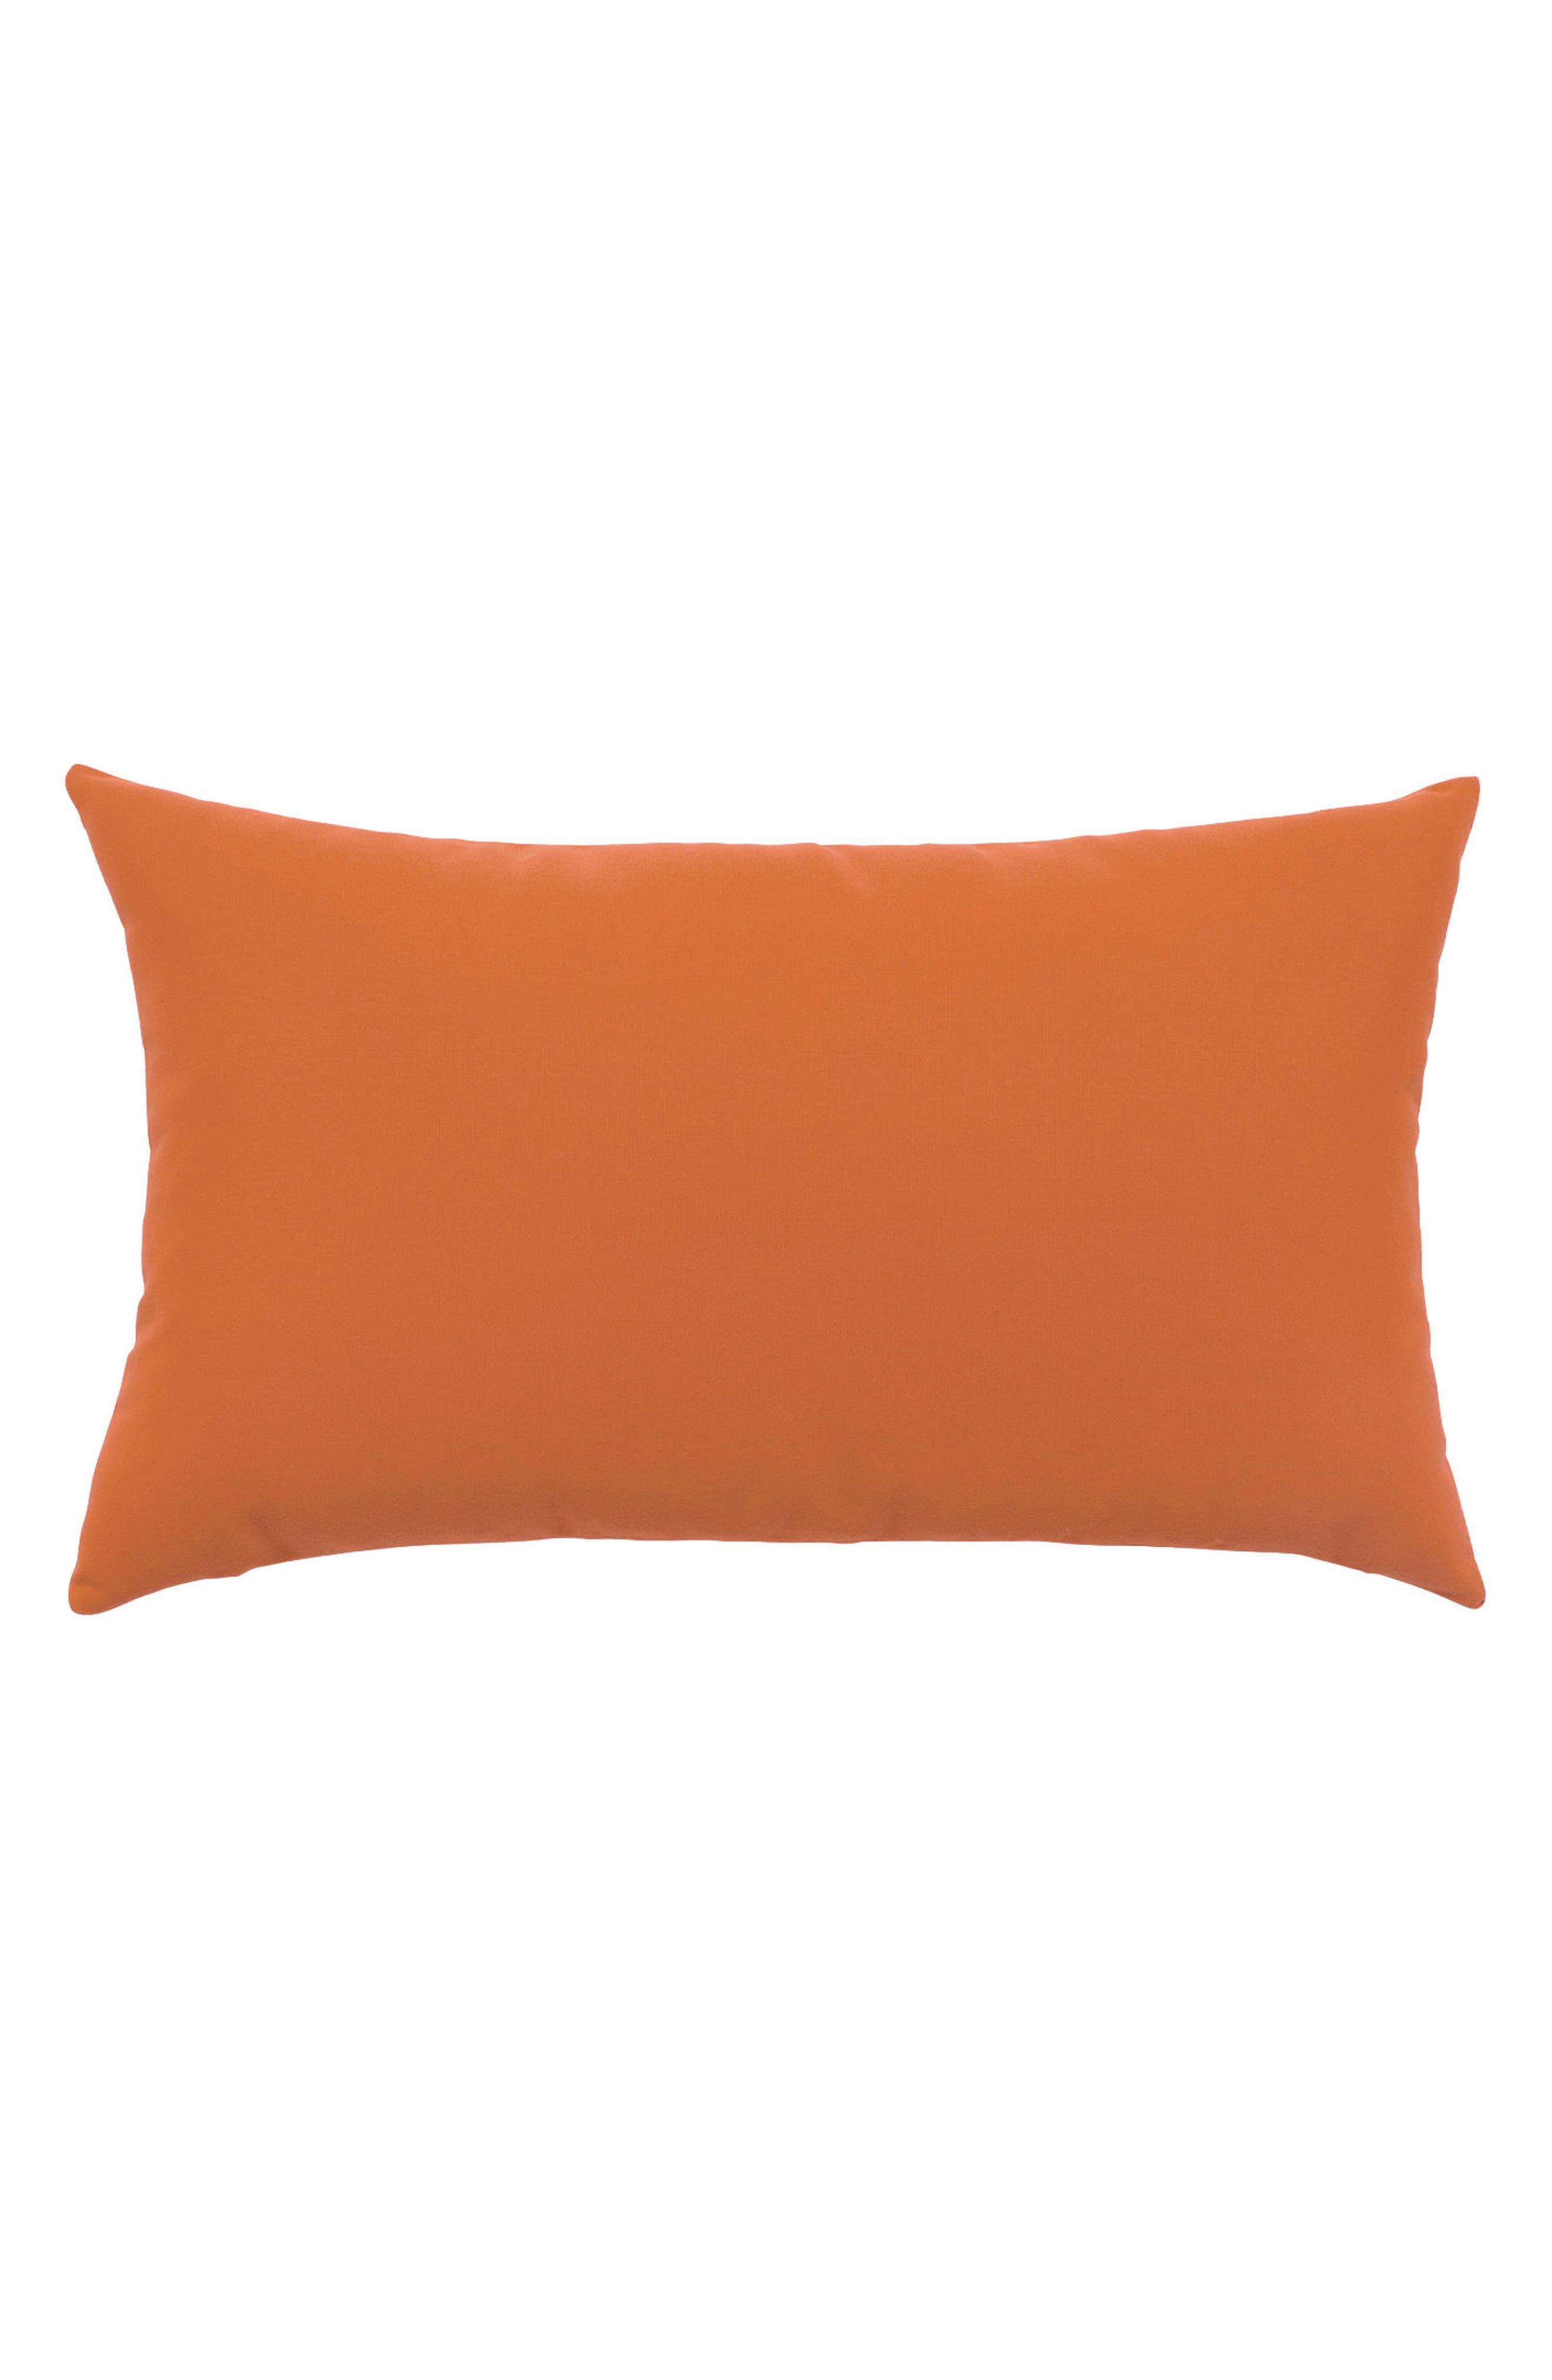 Basket Weave Indoor/Outdoor Accent Pillow,                             Alternate thumbnail 2, color,                             Orange